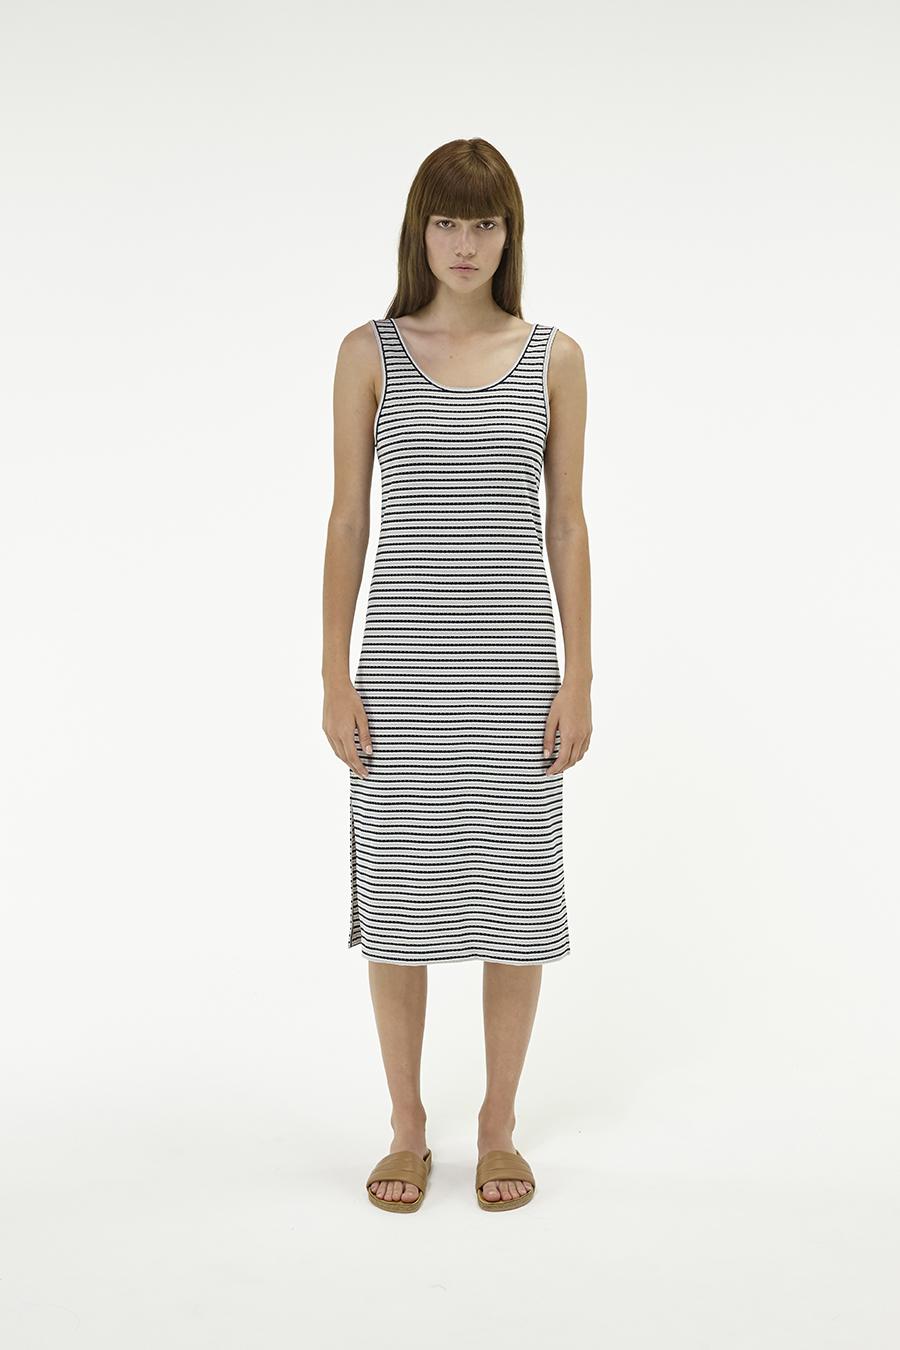 Huffer_Q3-16_W-Railway-Plaza-Dress_Black-Grey-01